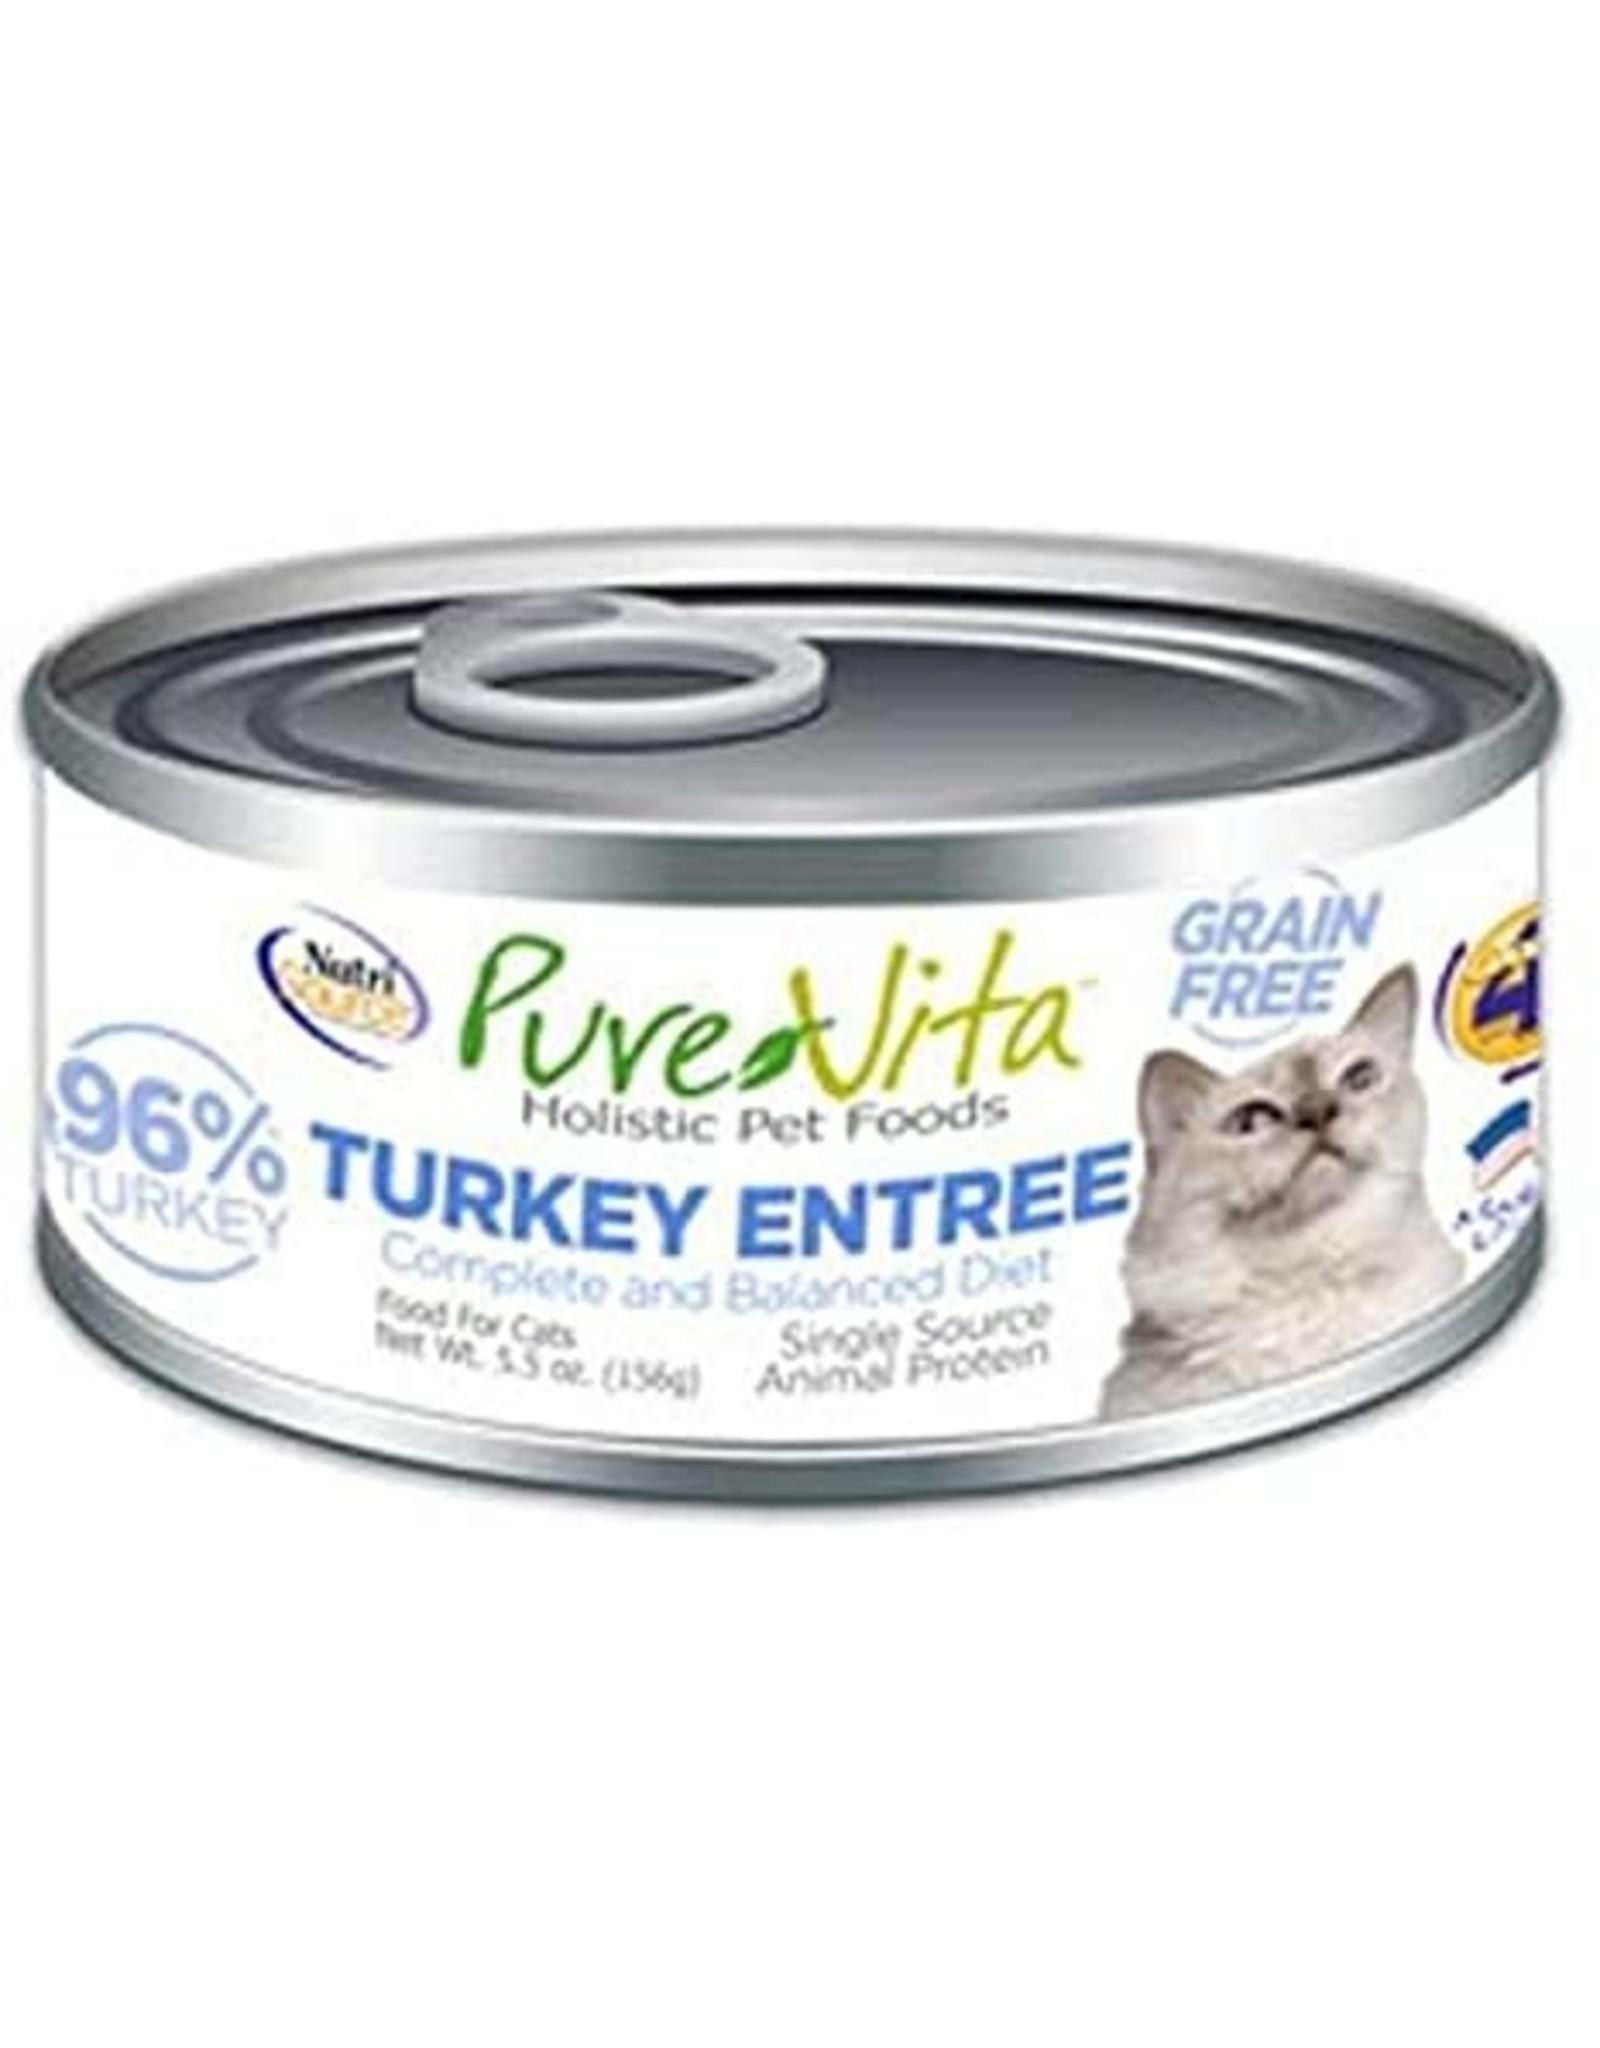 KLN PureVita: cat GF Turkey & Liver 5.5oz single